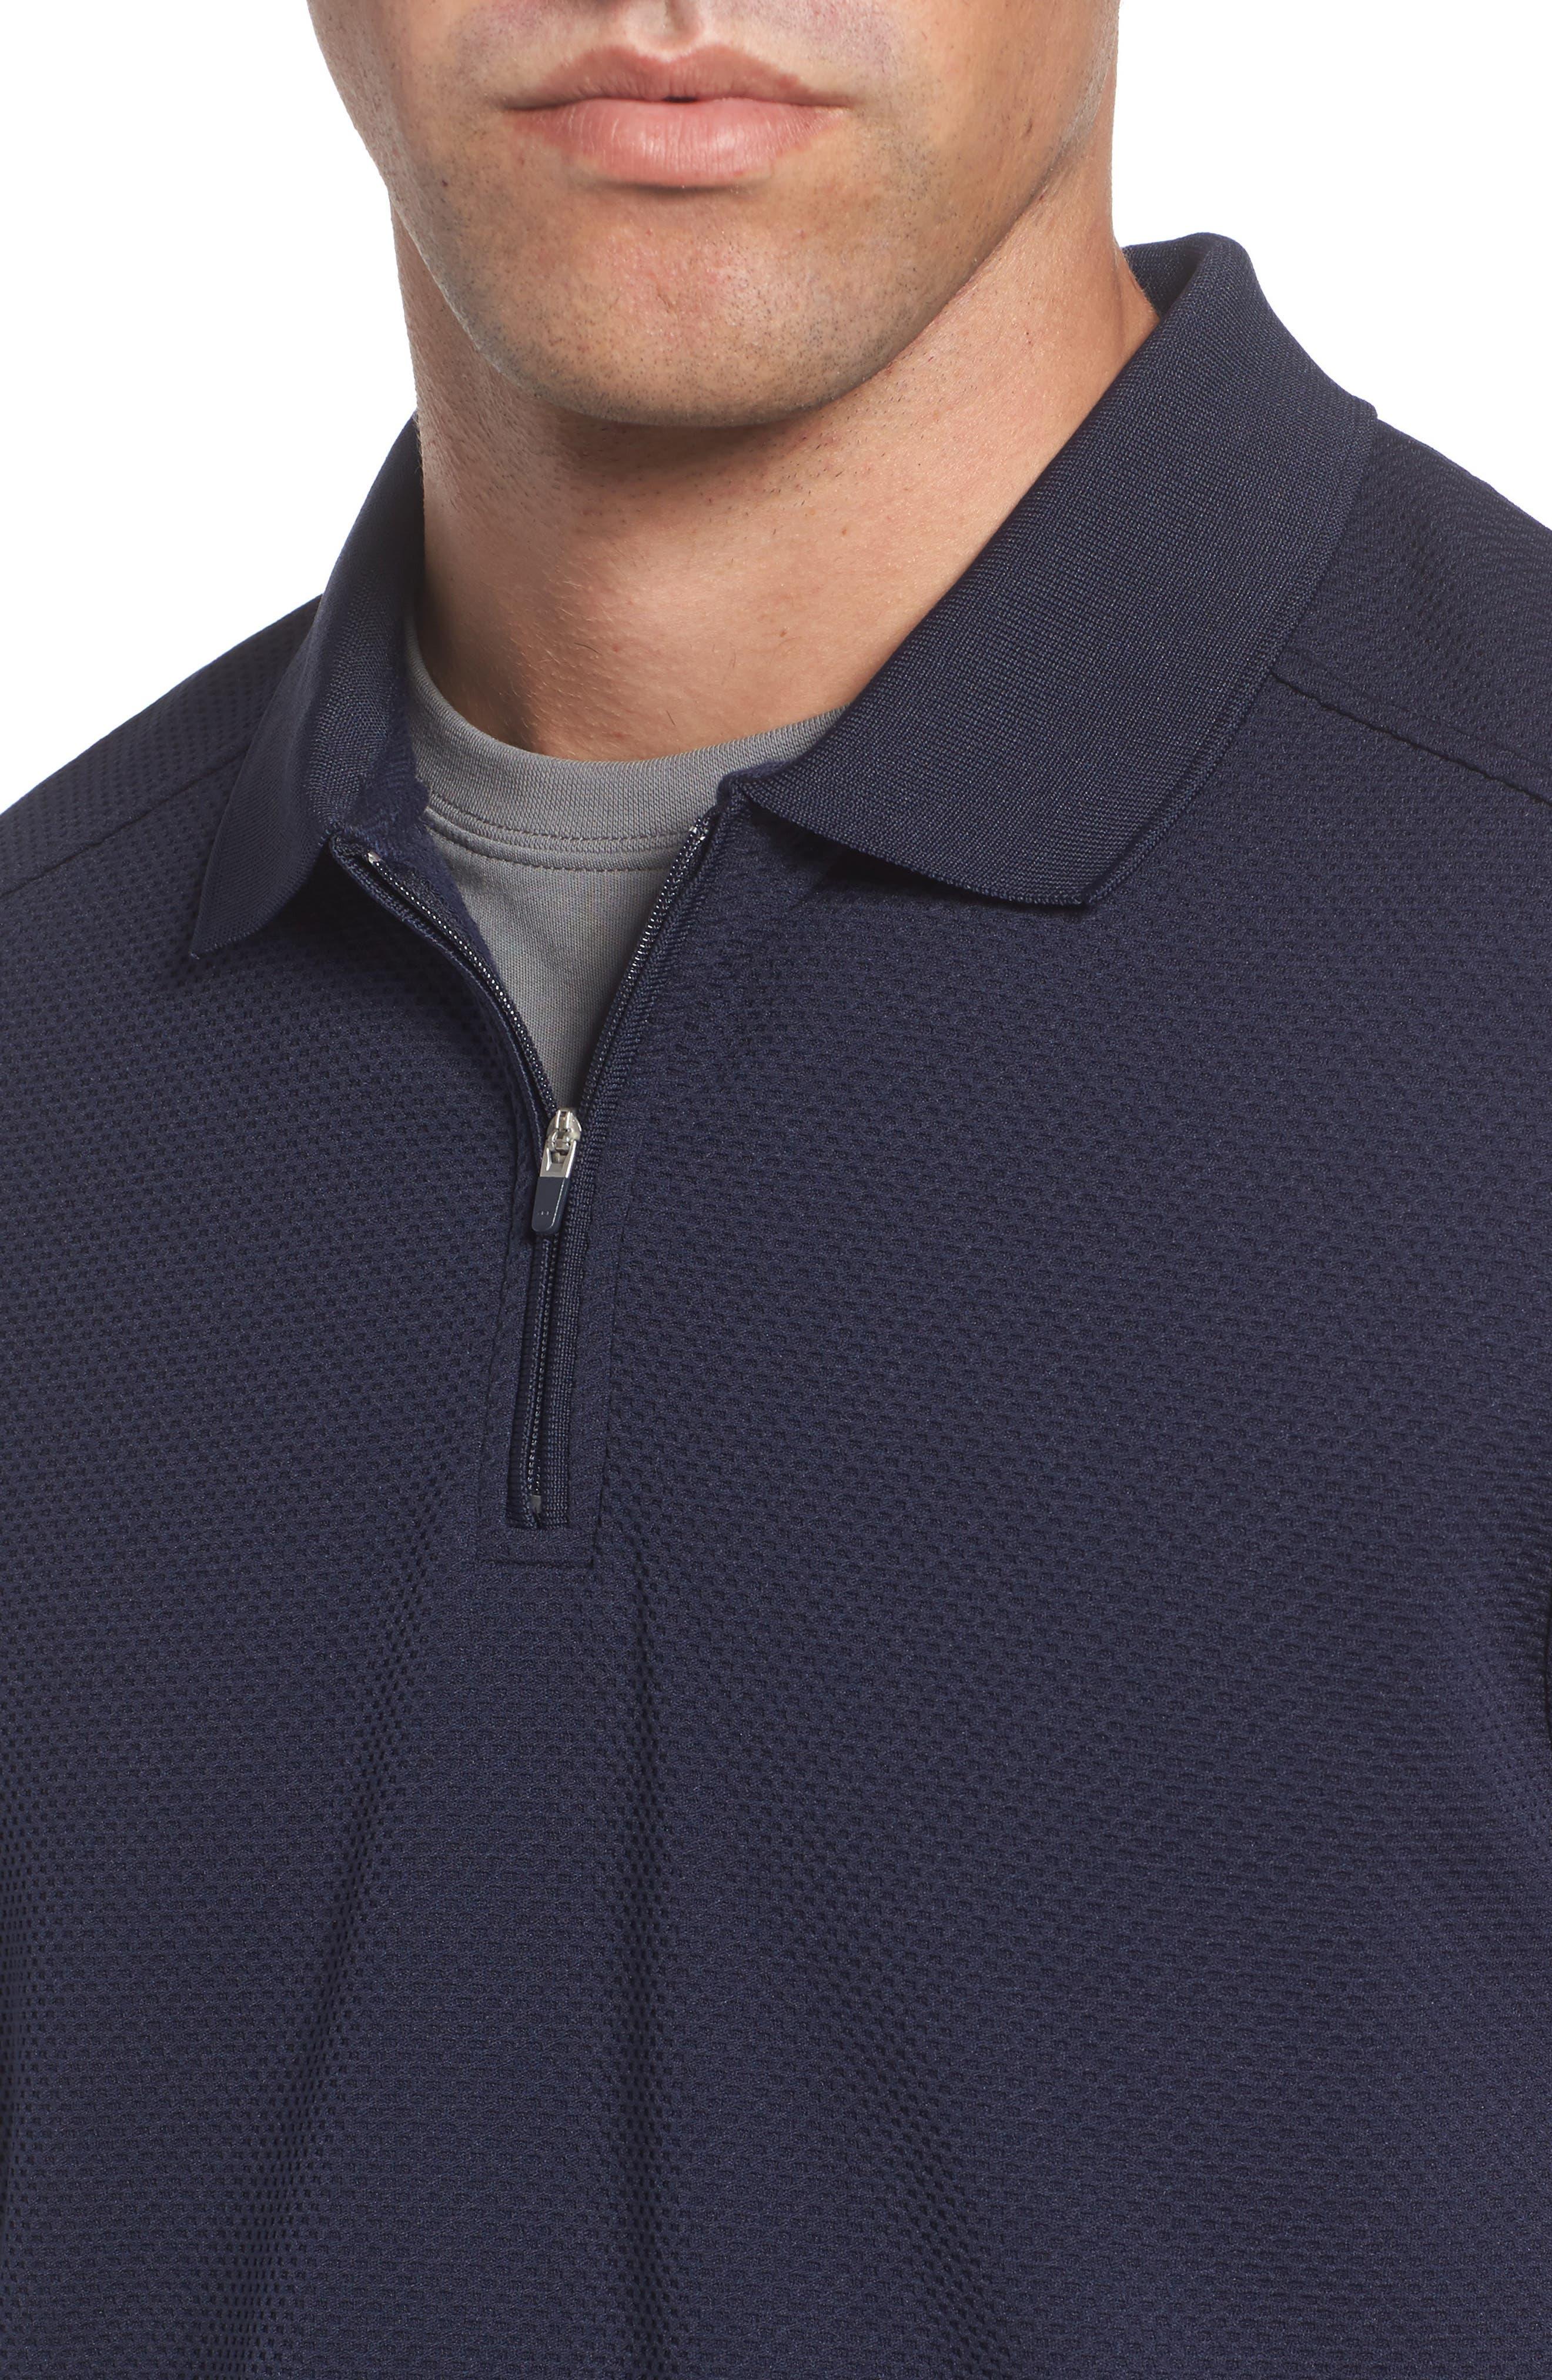 Slim Fit Quarter Zip Mesh Polo,                             Alternate thumbnail 4, color,                             Navy